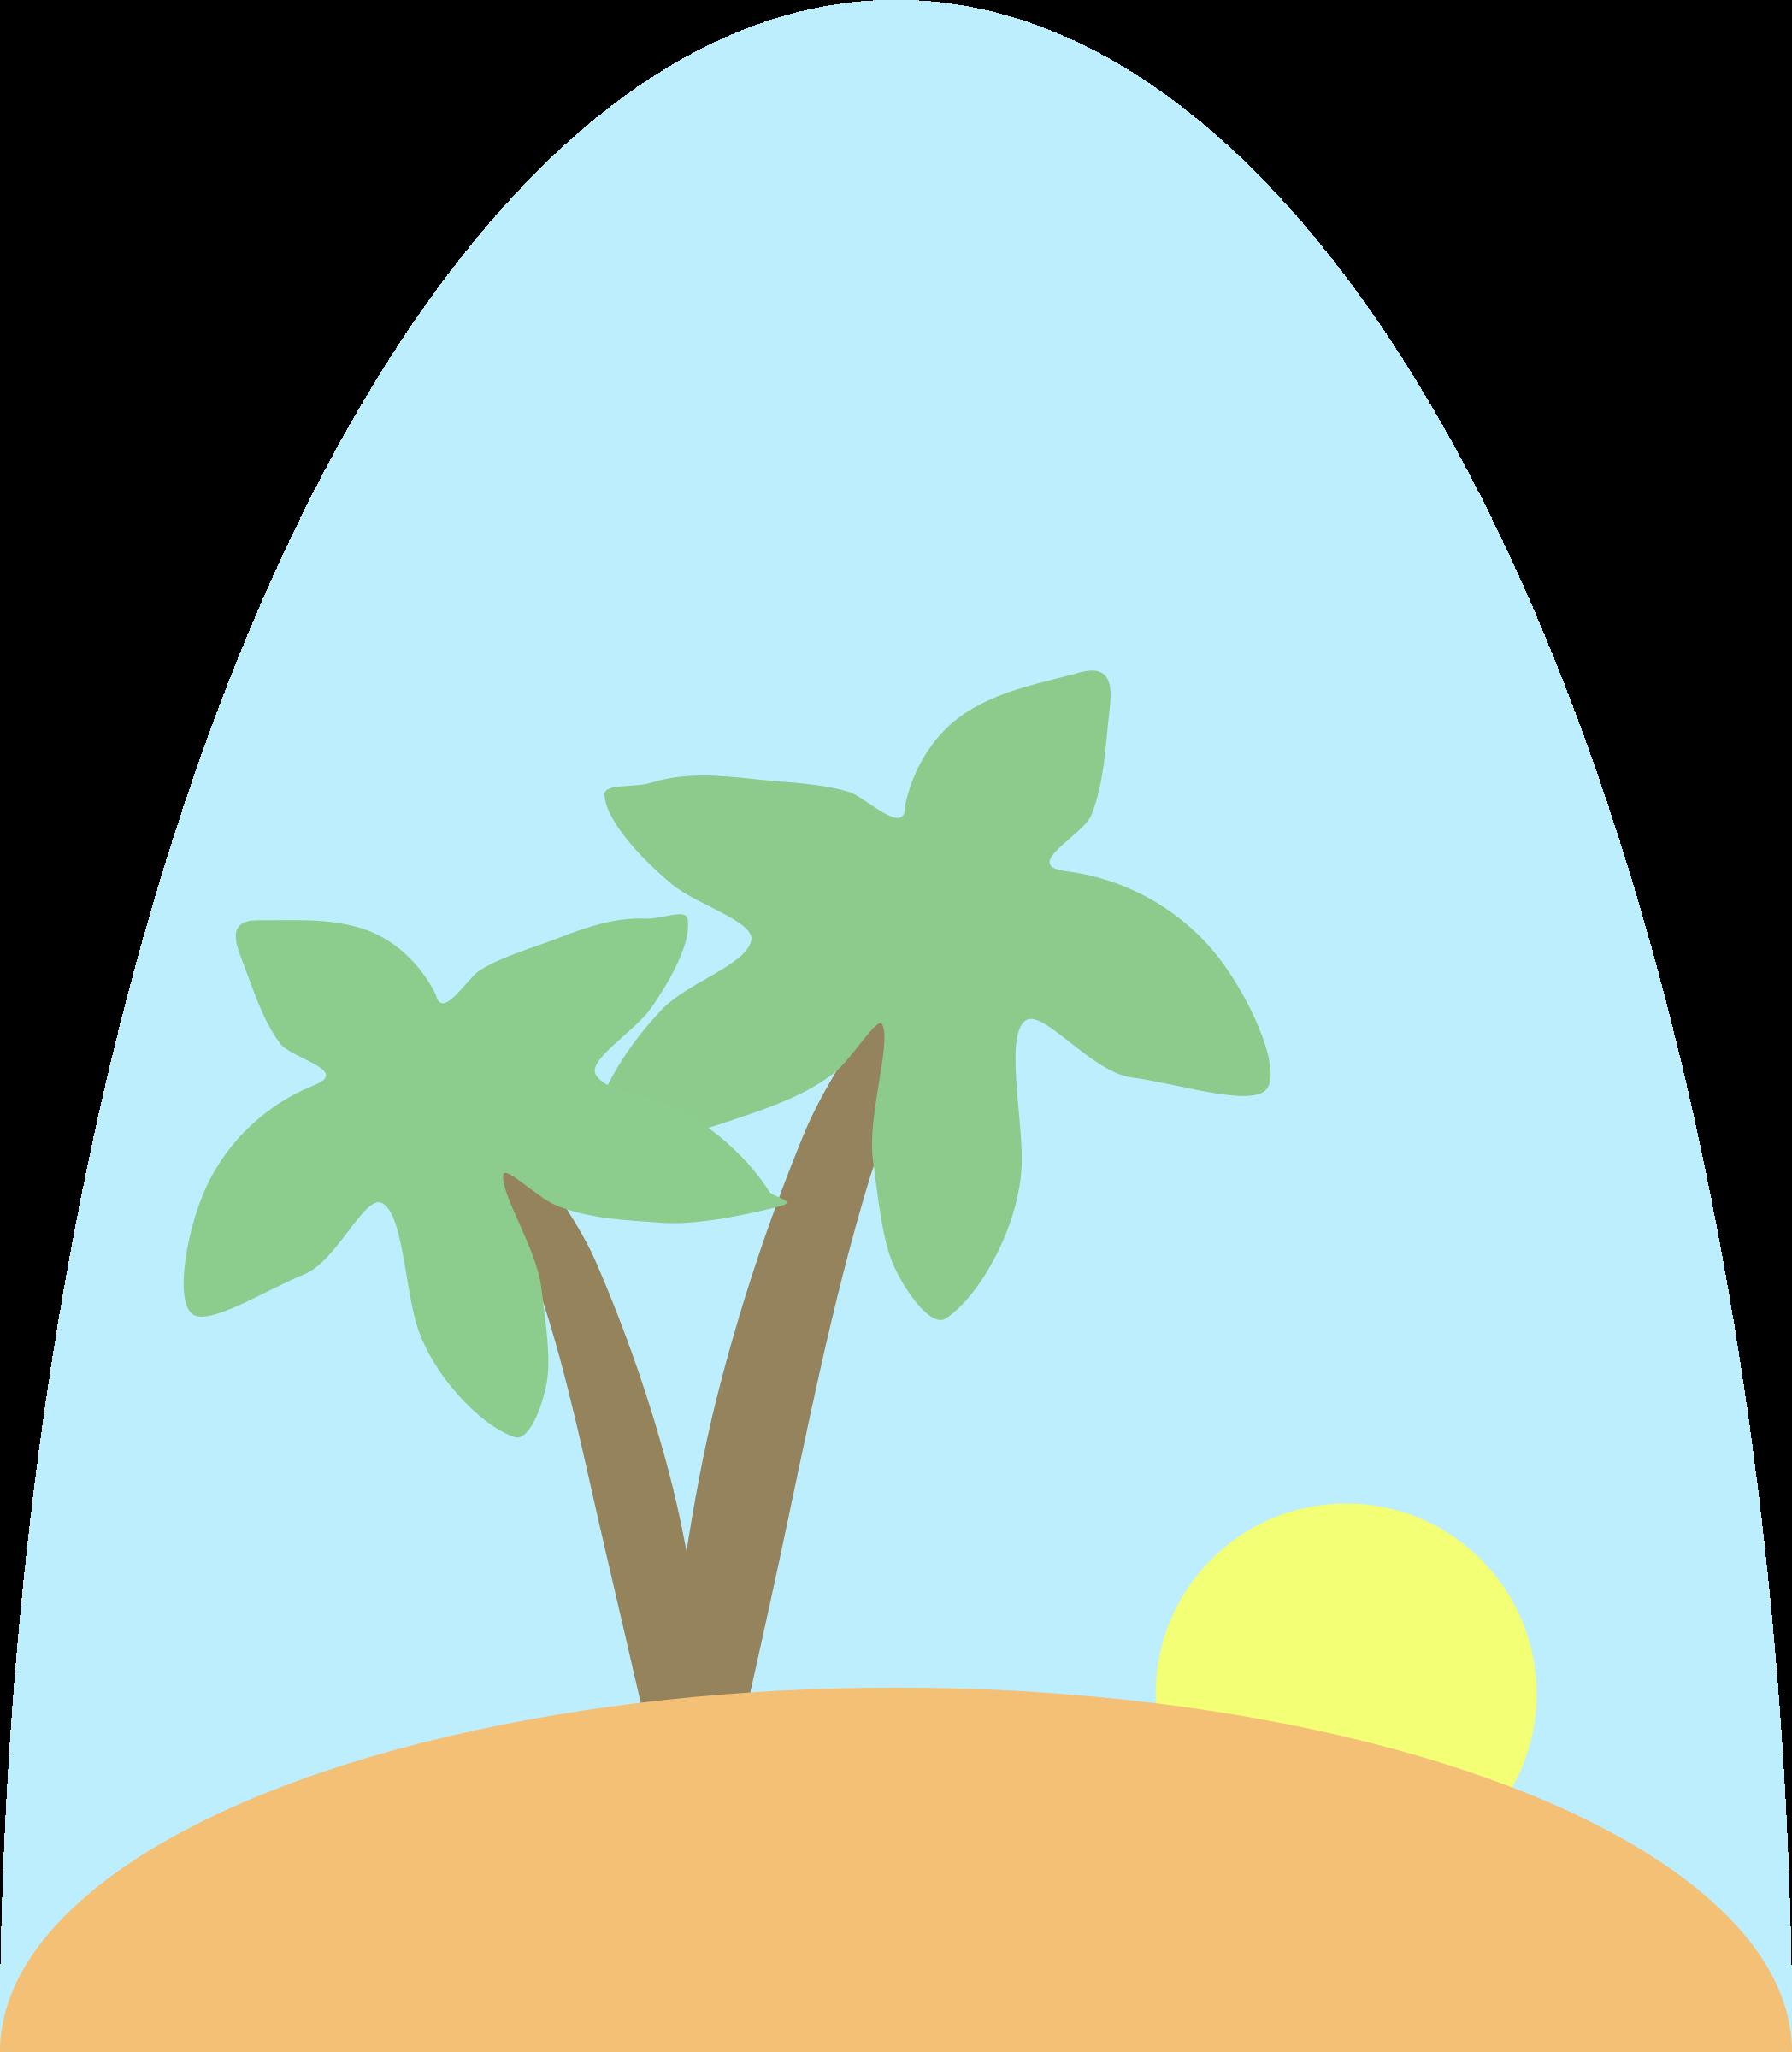 Island big image png. Tree clipart scene